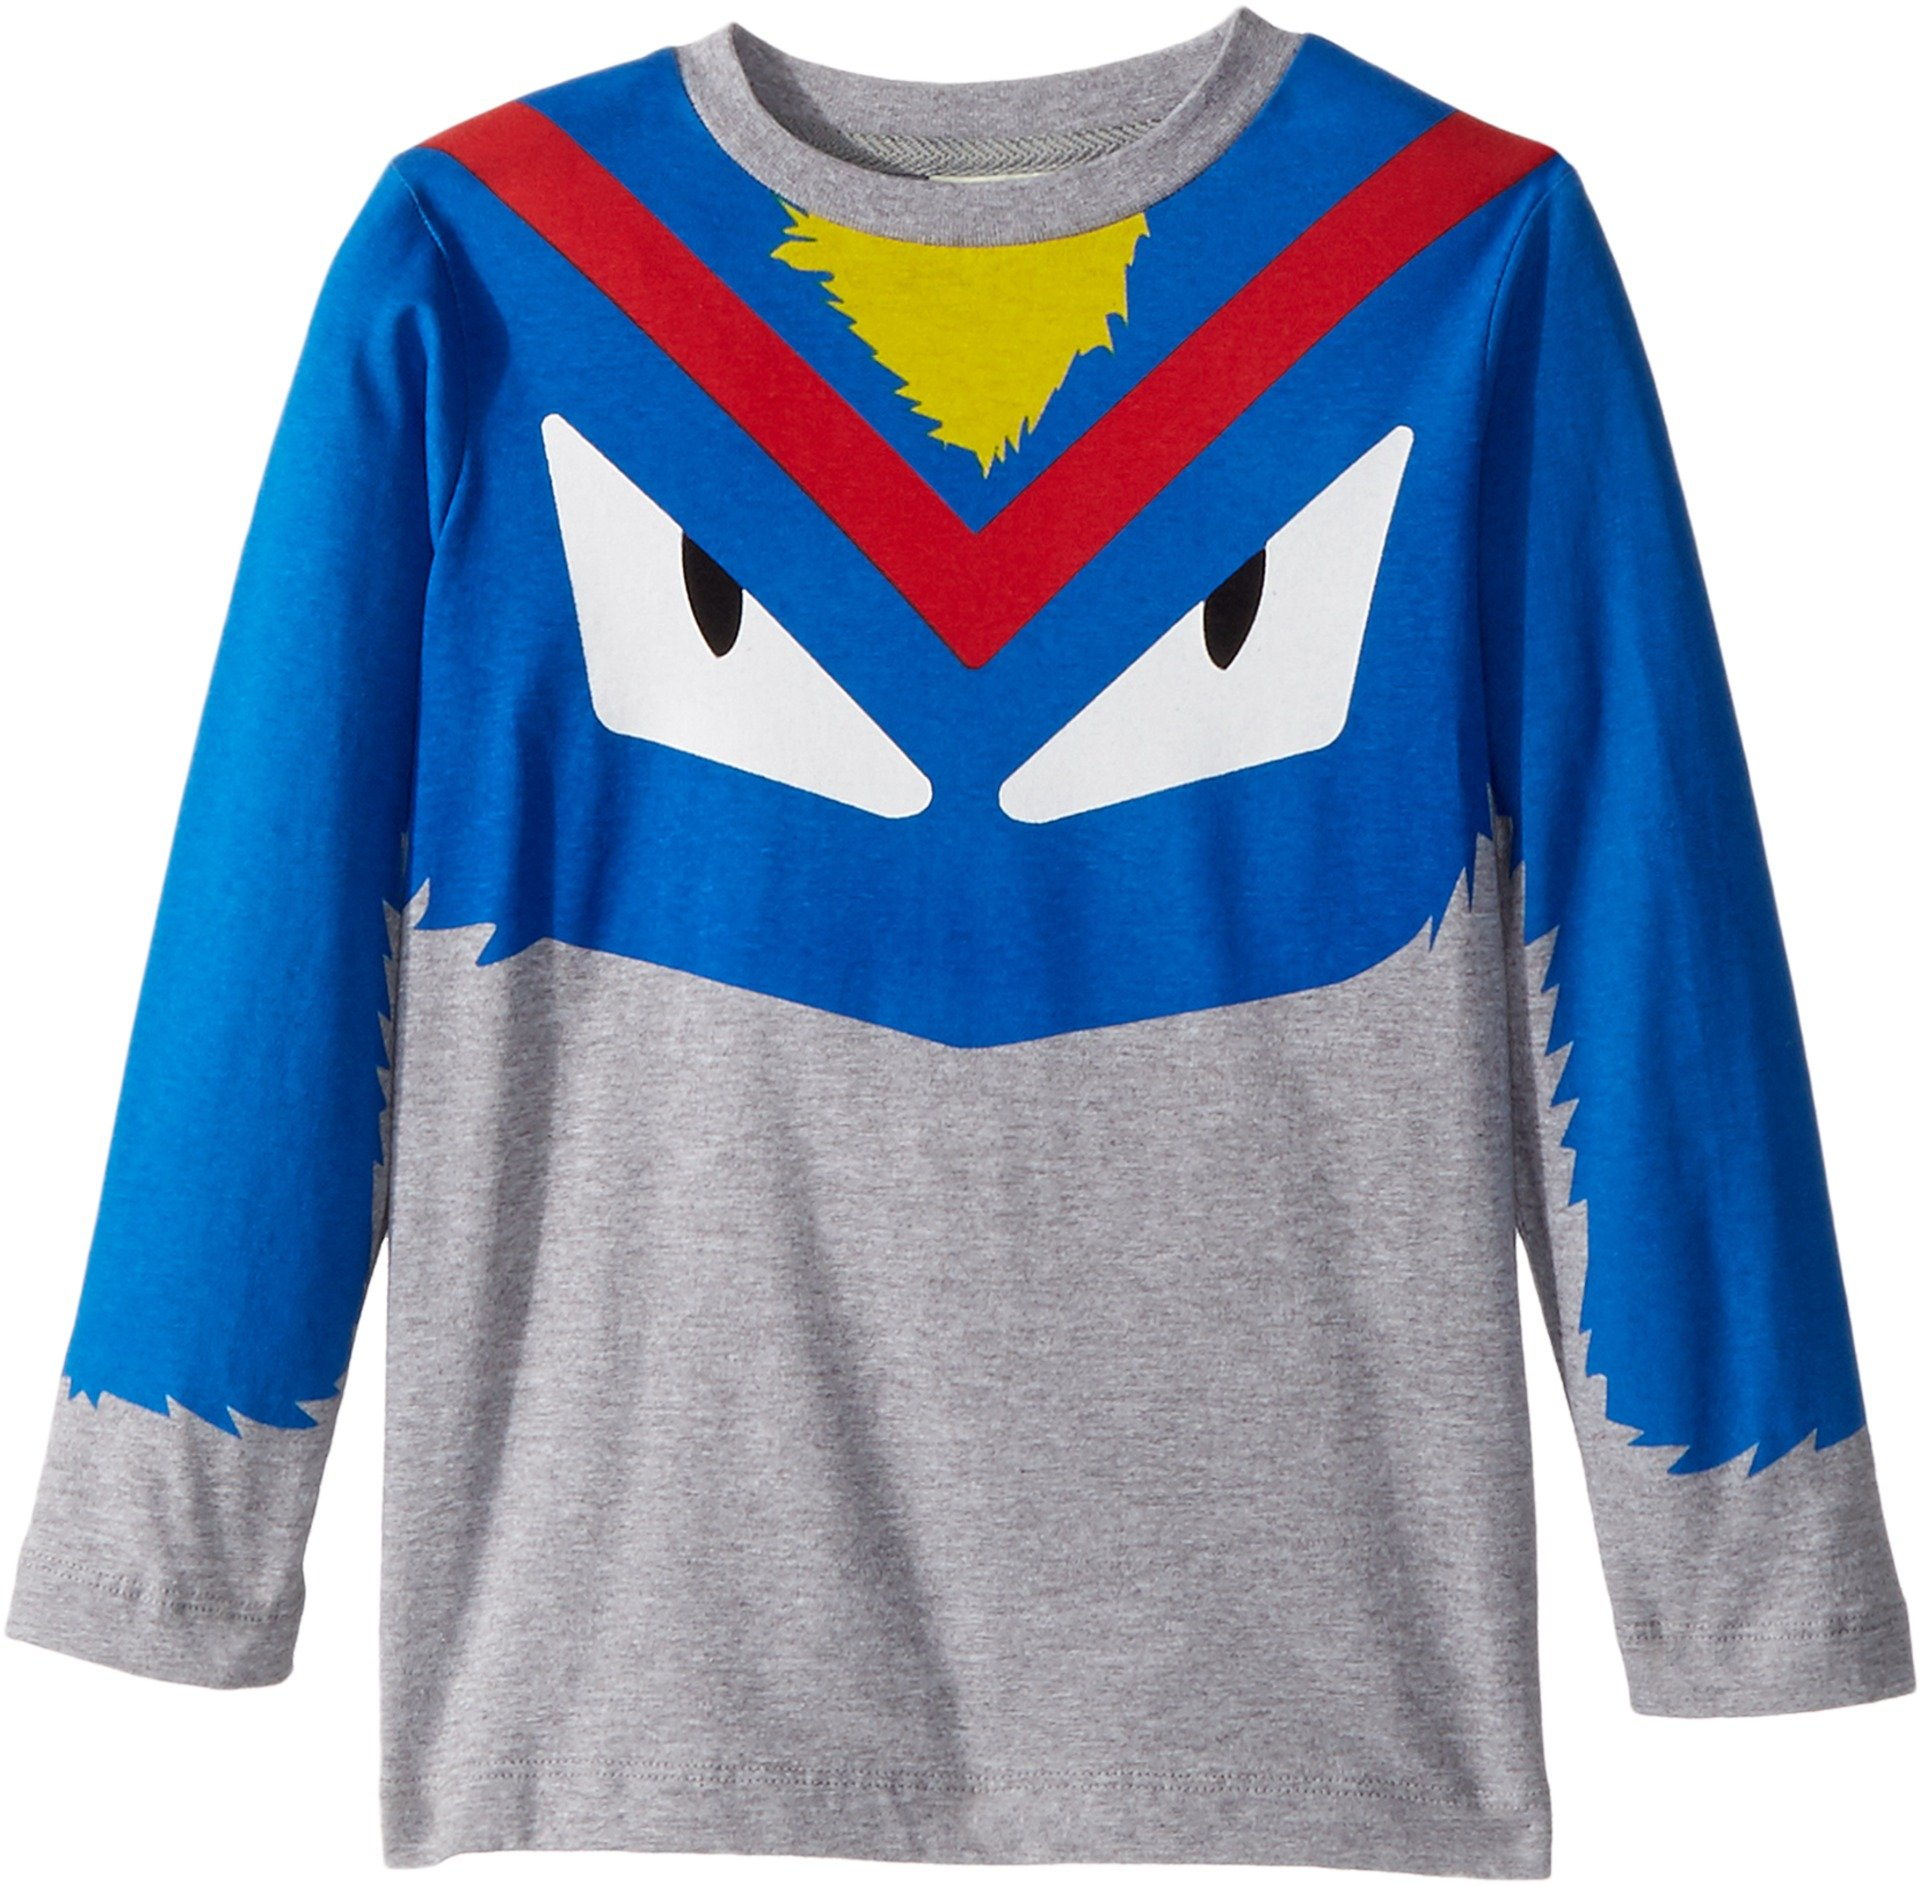 Fendi Kids  Boy's Long Sleeve Monster Eyes Graphic T-Shirt (Little Kids) Grey/Multi 4  Years by Fendi Kids